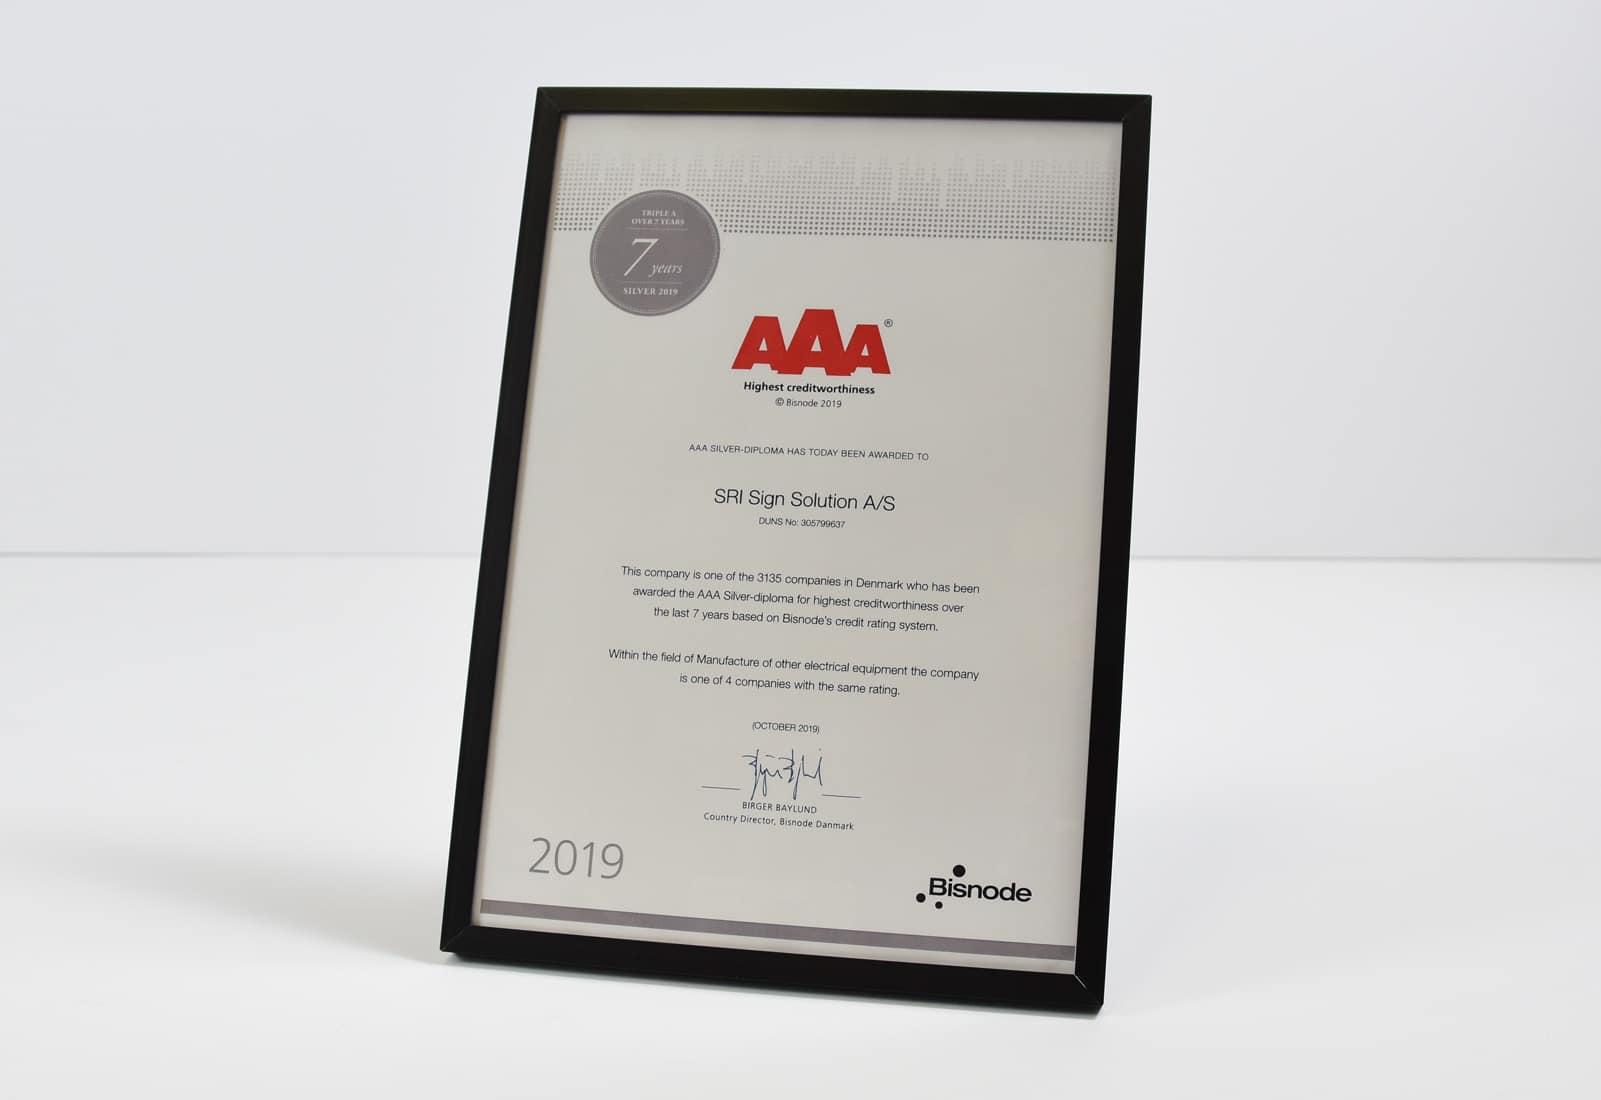 AAA diplom - nu 7 år - SRI Sign Solution A/S